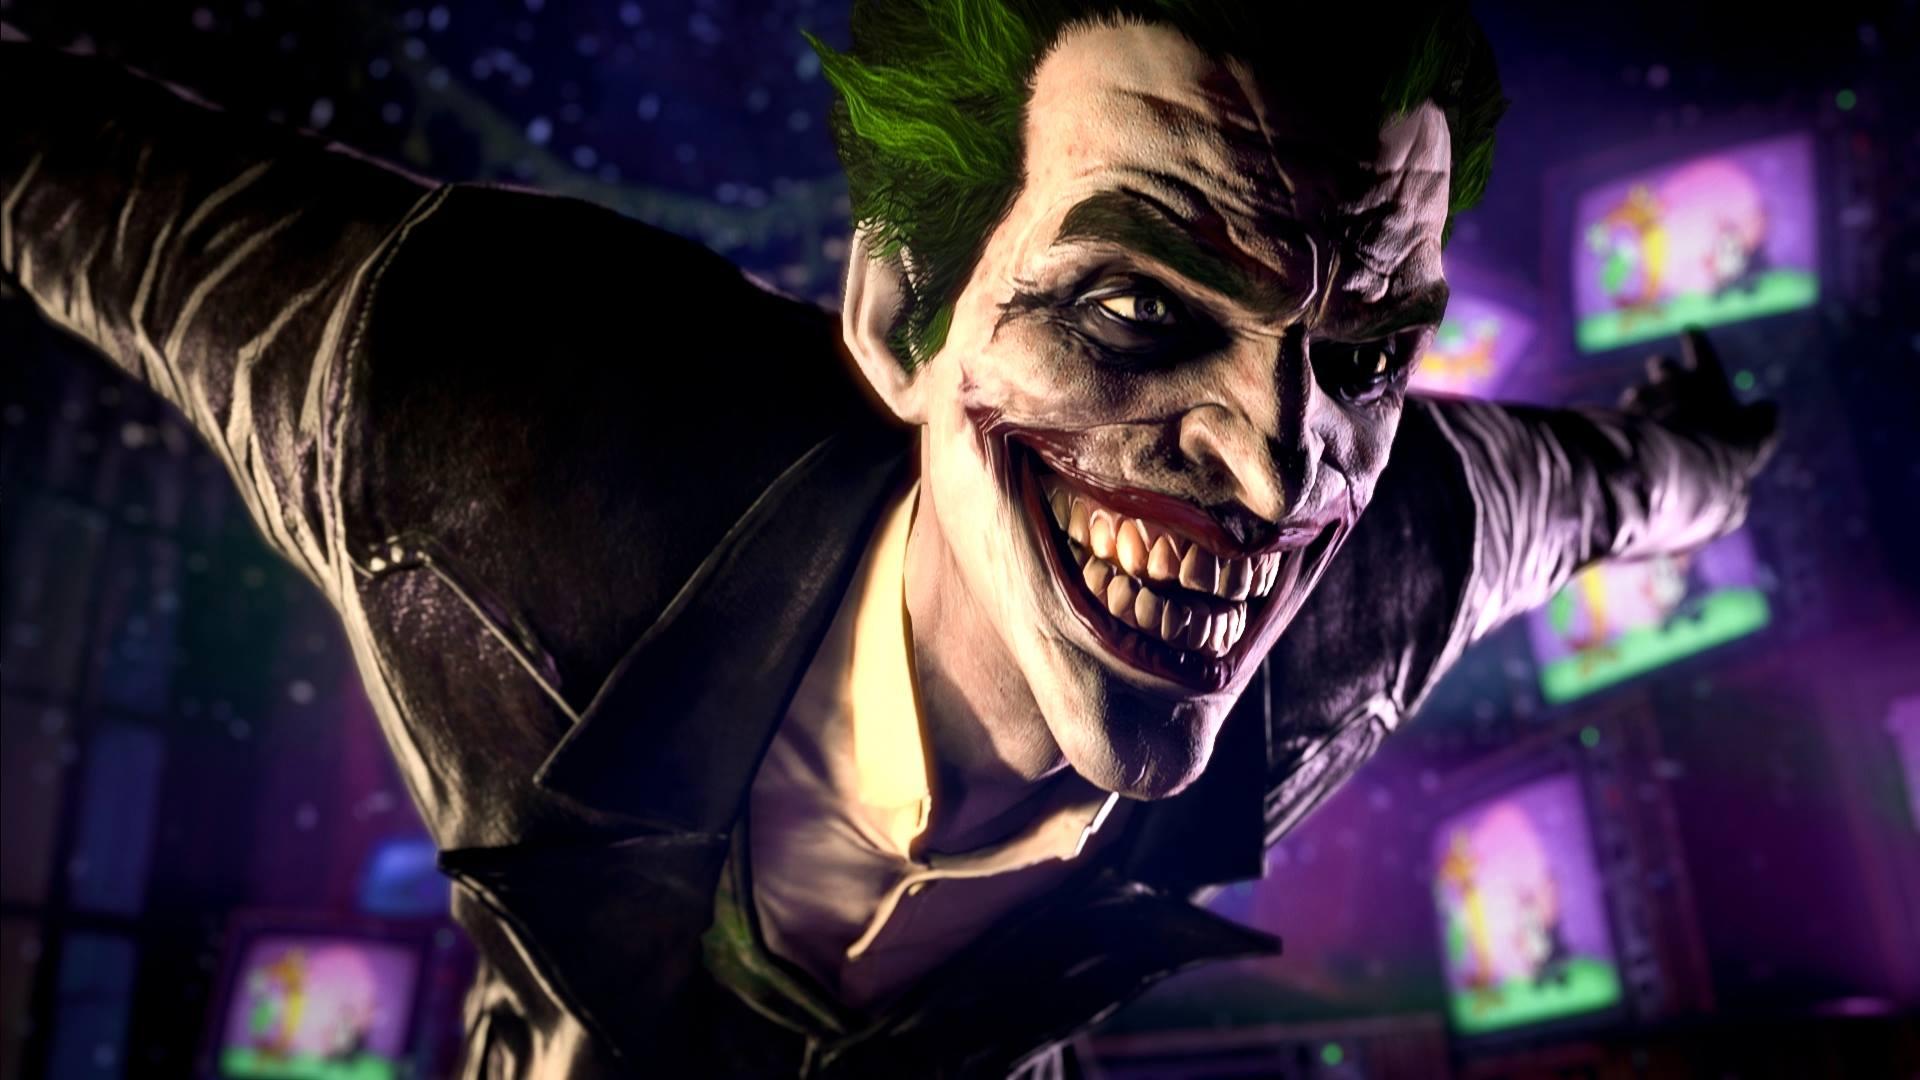 Joker Wallpaper Arkham Origins Best Quality ~ Wallpaper ...